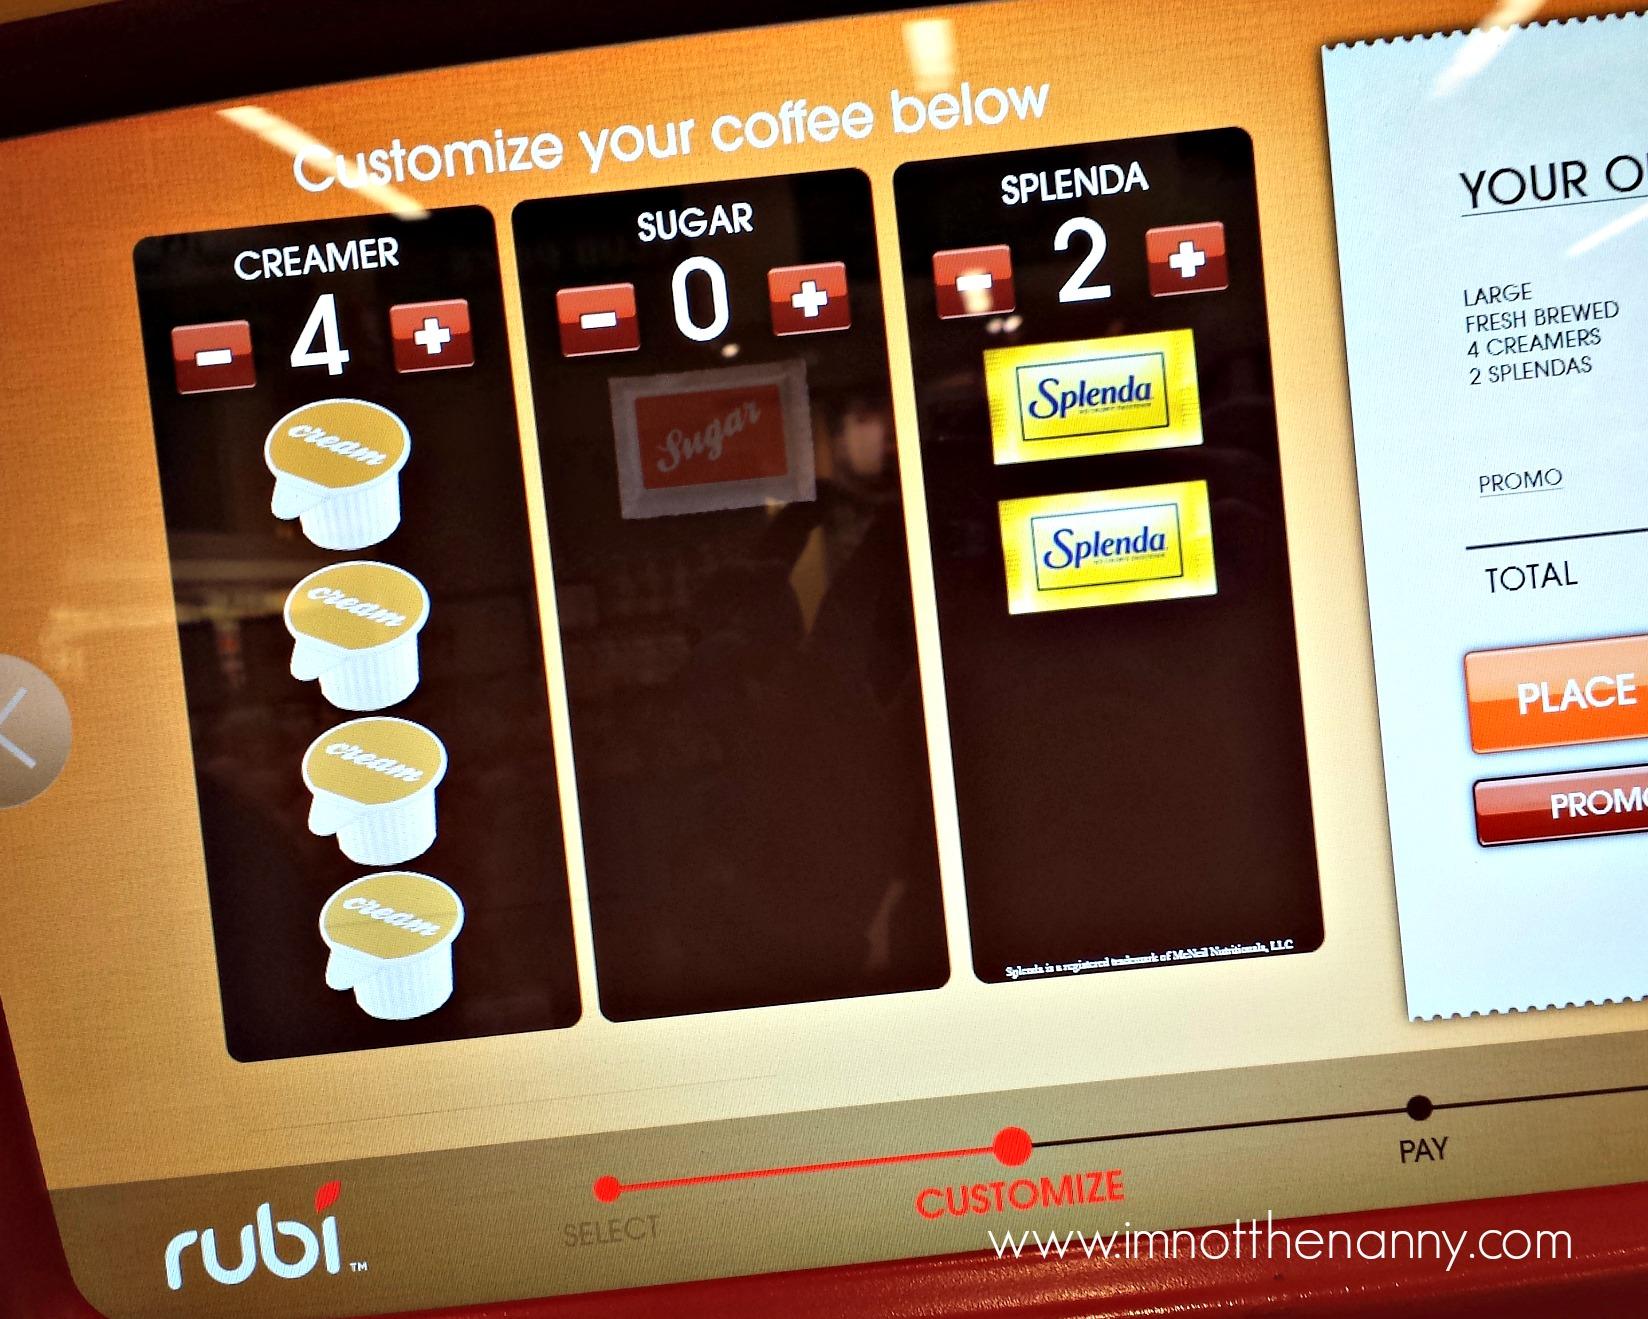 Customize my coffee at Rubi Kiosk #Rubi2Go #shop